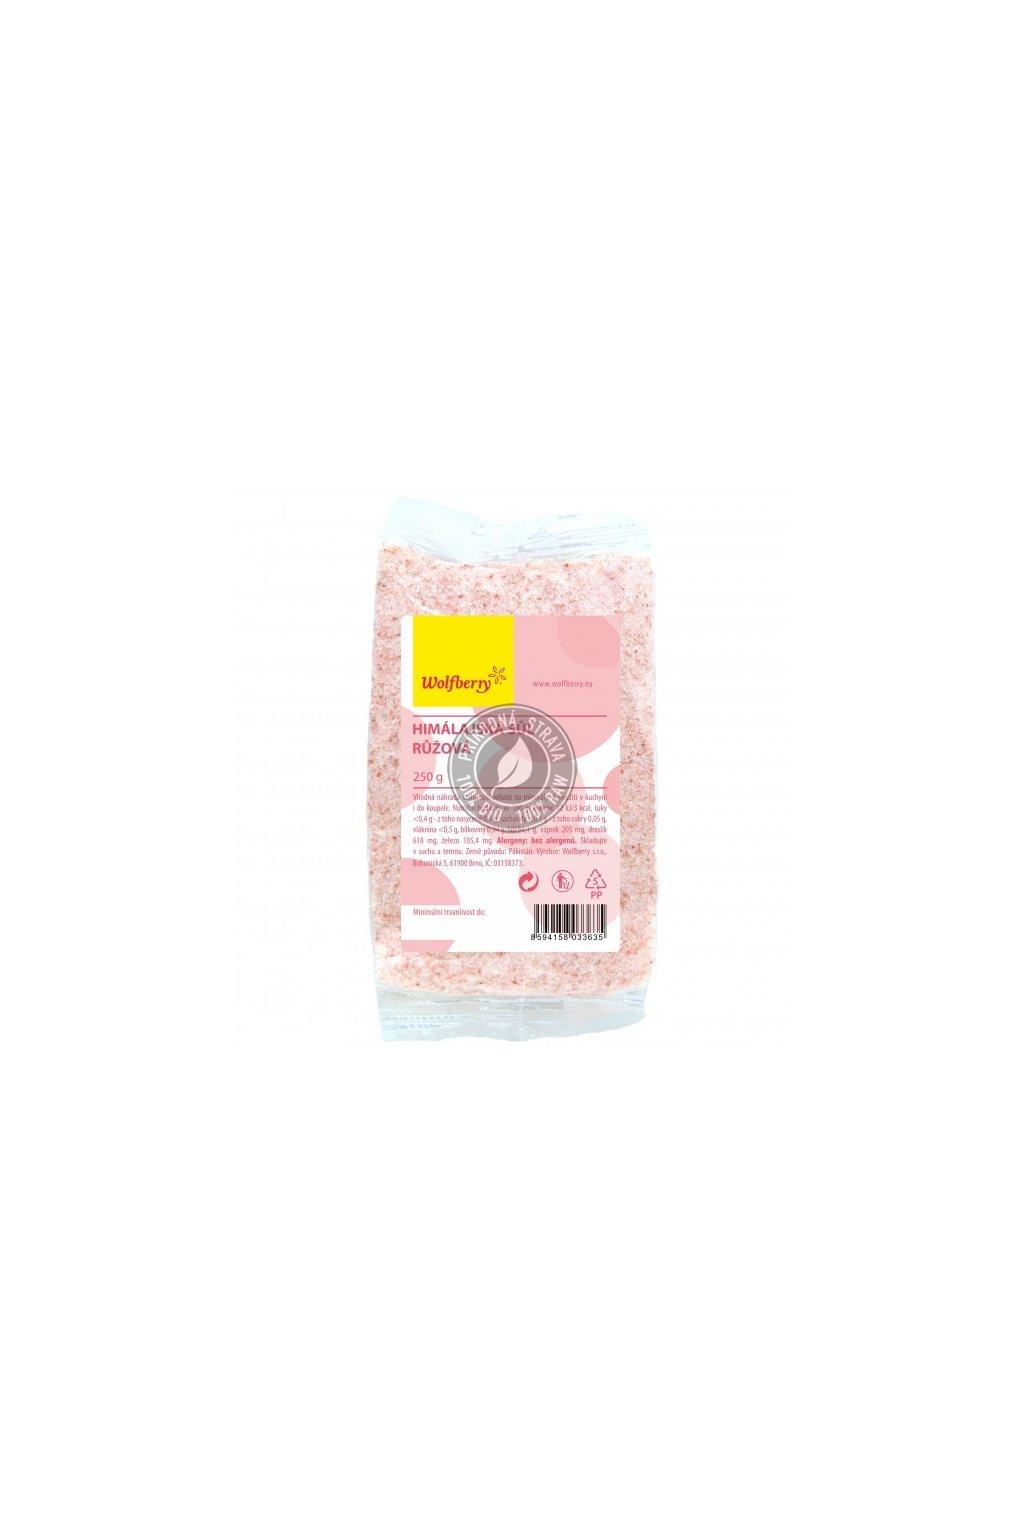 Soľ himalájská ružová jemná - 250g